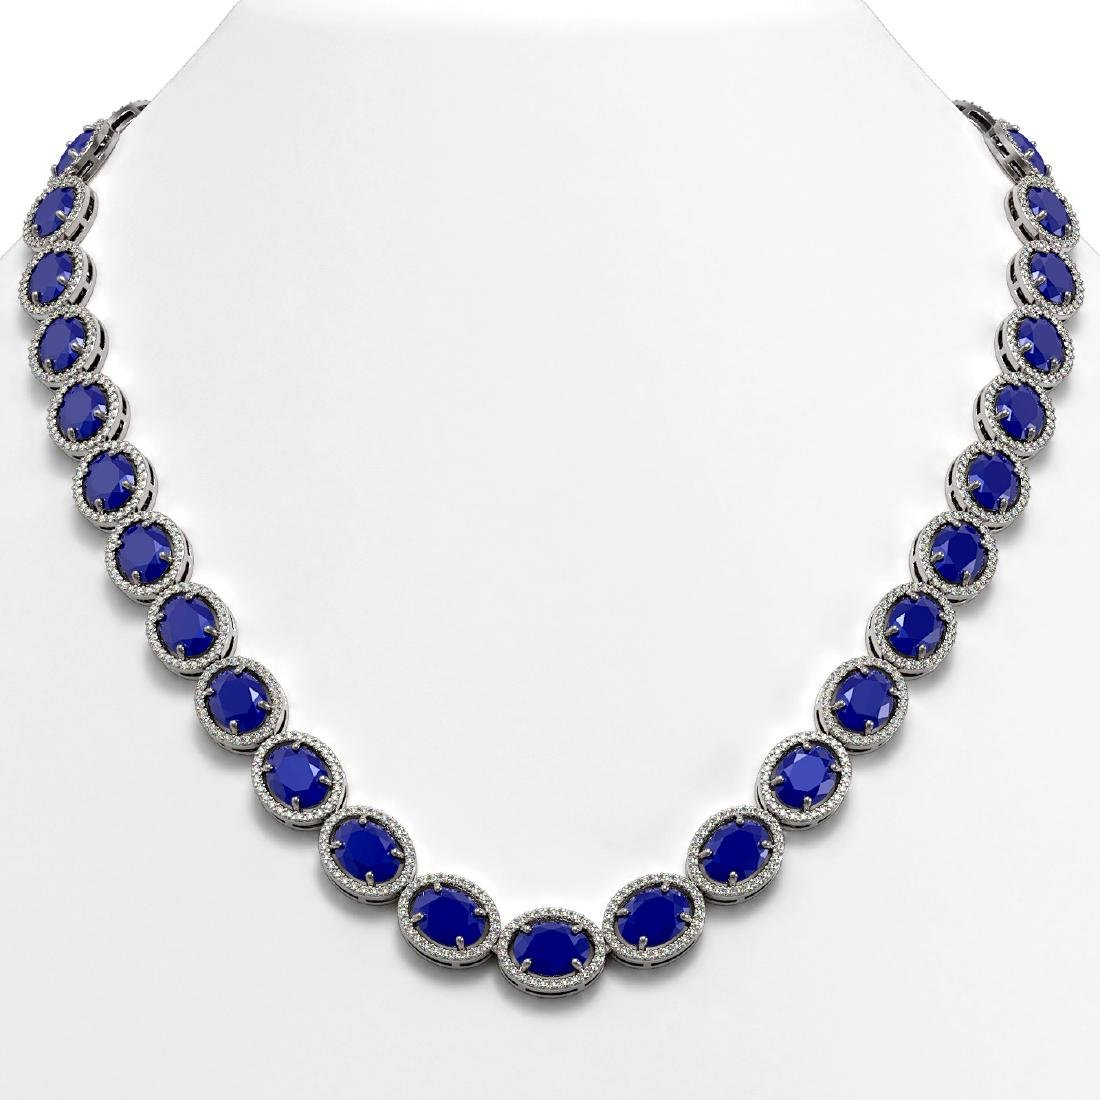 71.87 CTW Sapphire & Diamond Halo Necklace 10K White